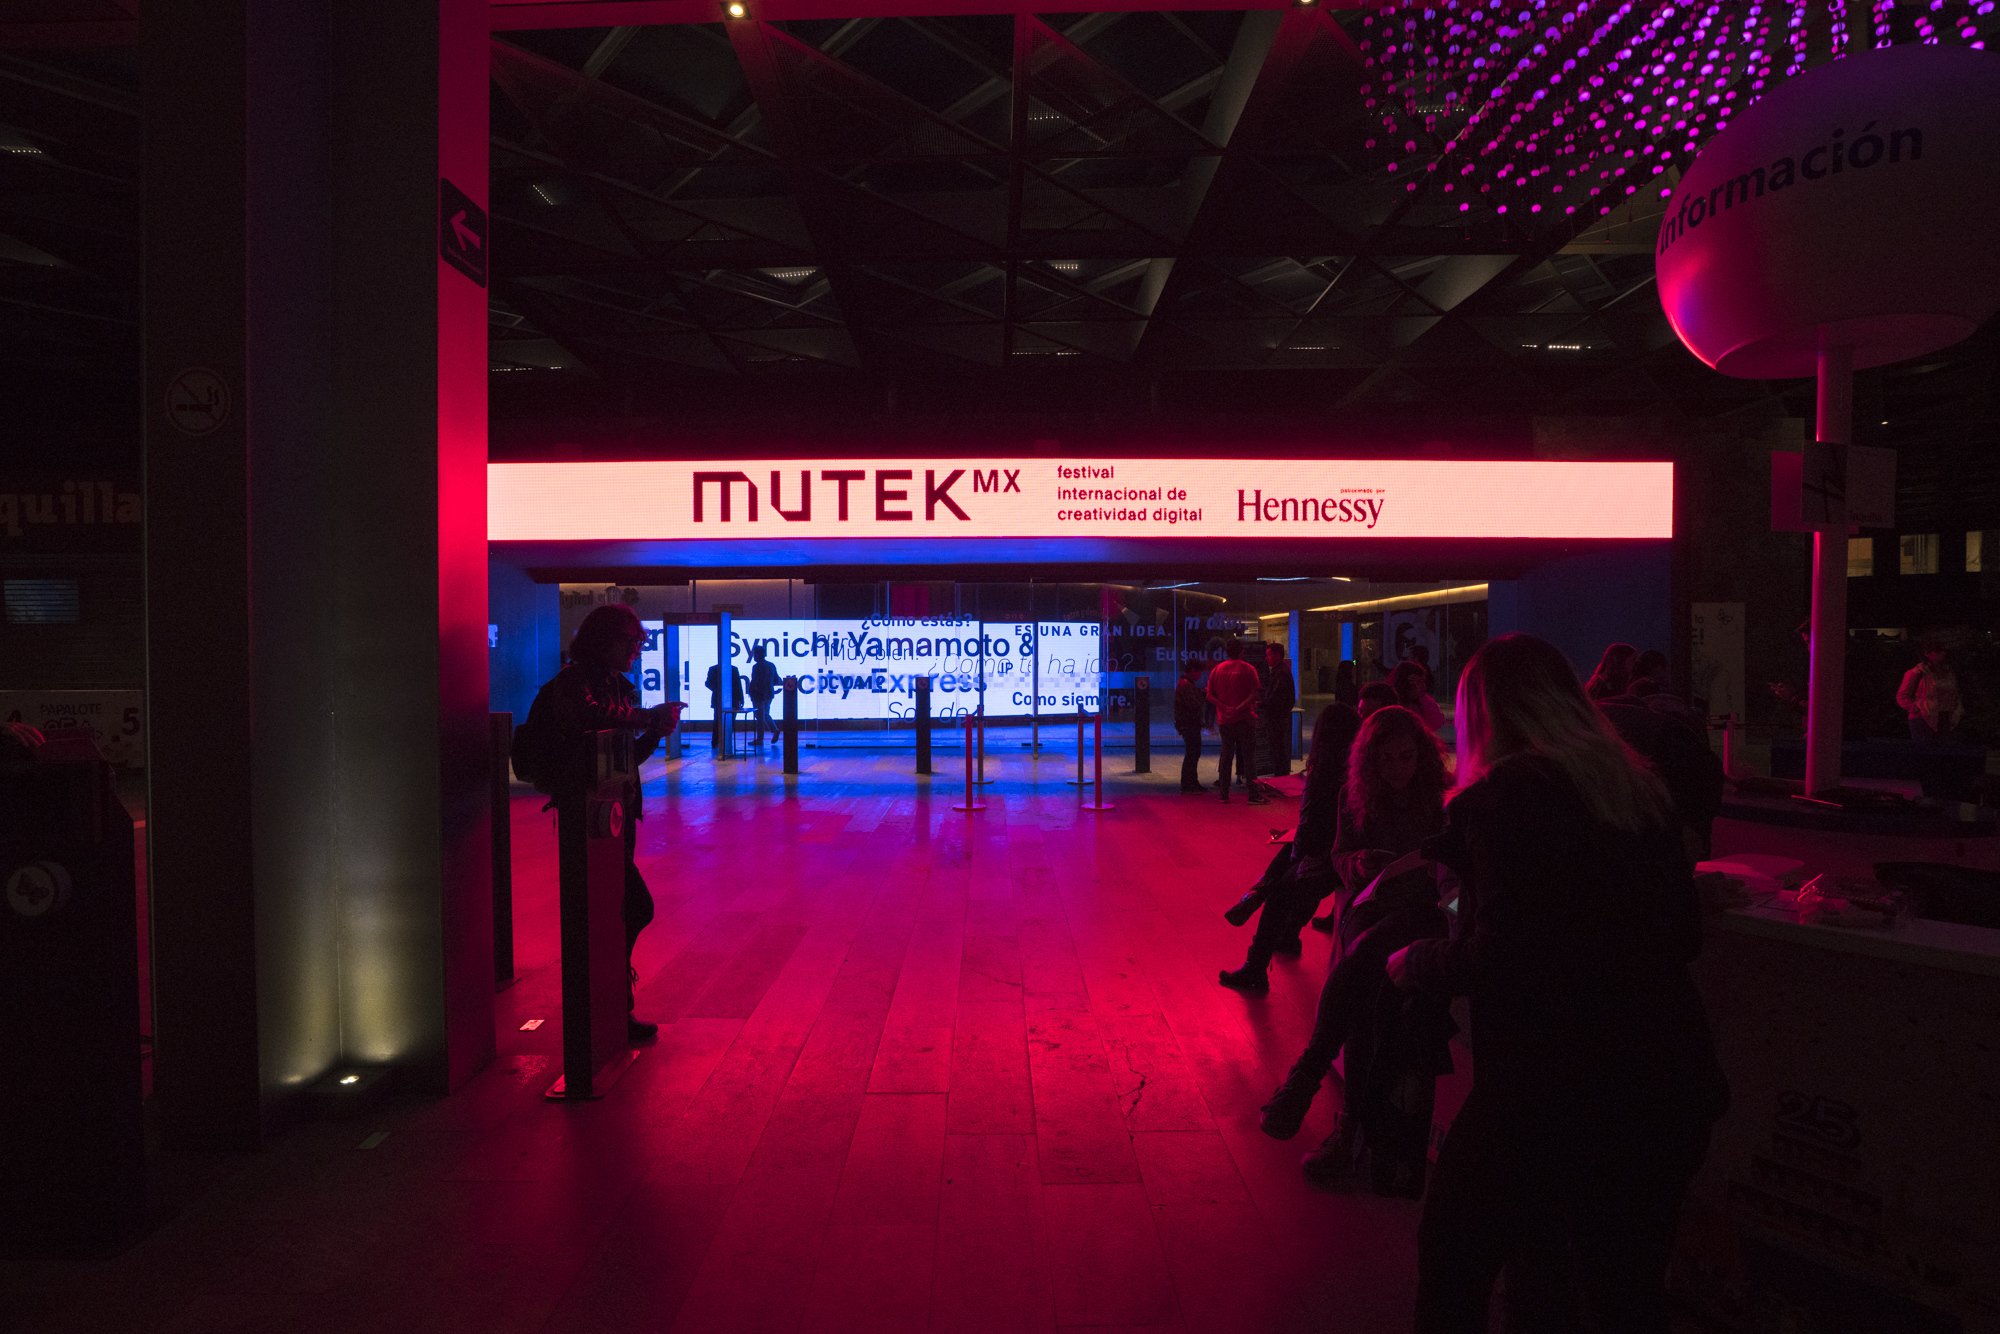 ¡MUTEK MX 2018 ya comenzó! Estas son las mejores fotos de A/Visions 1